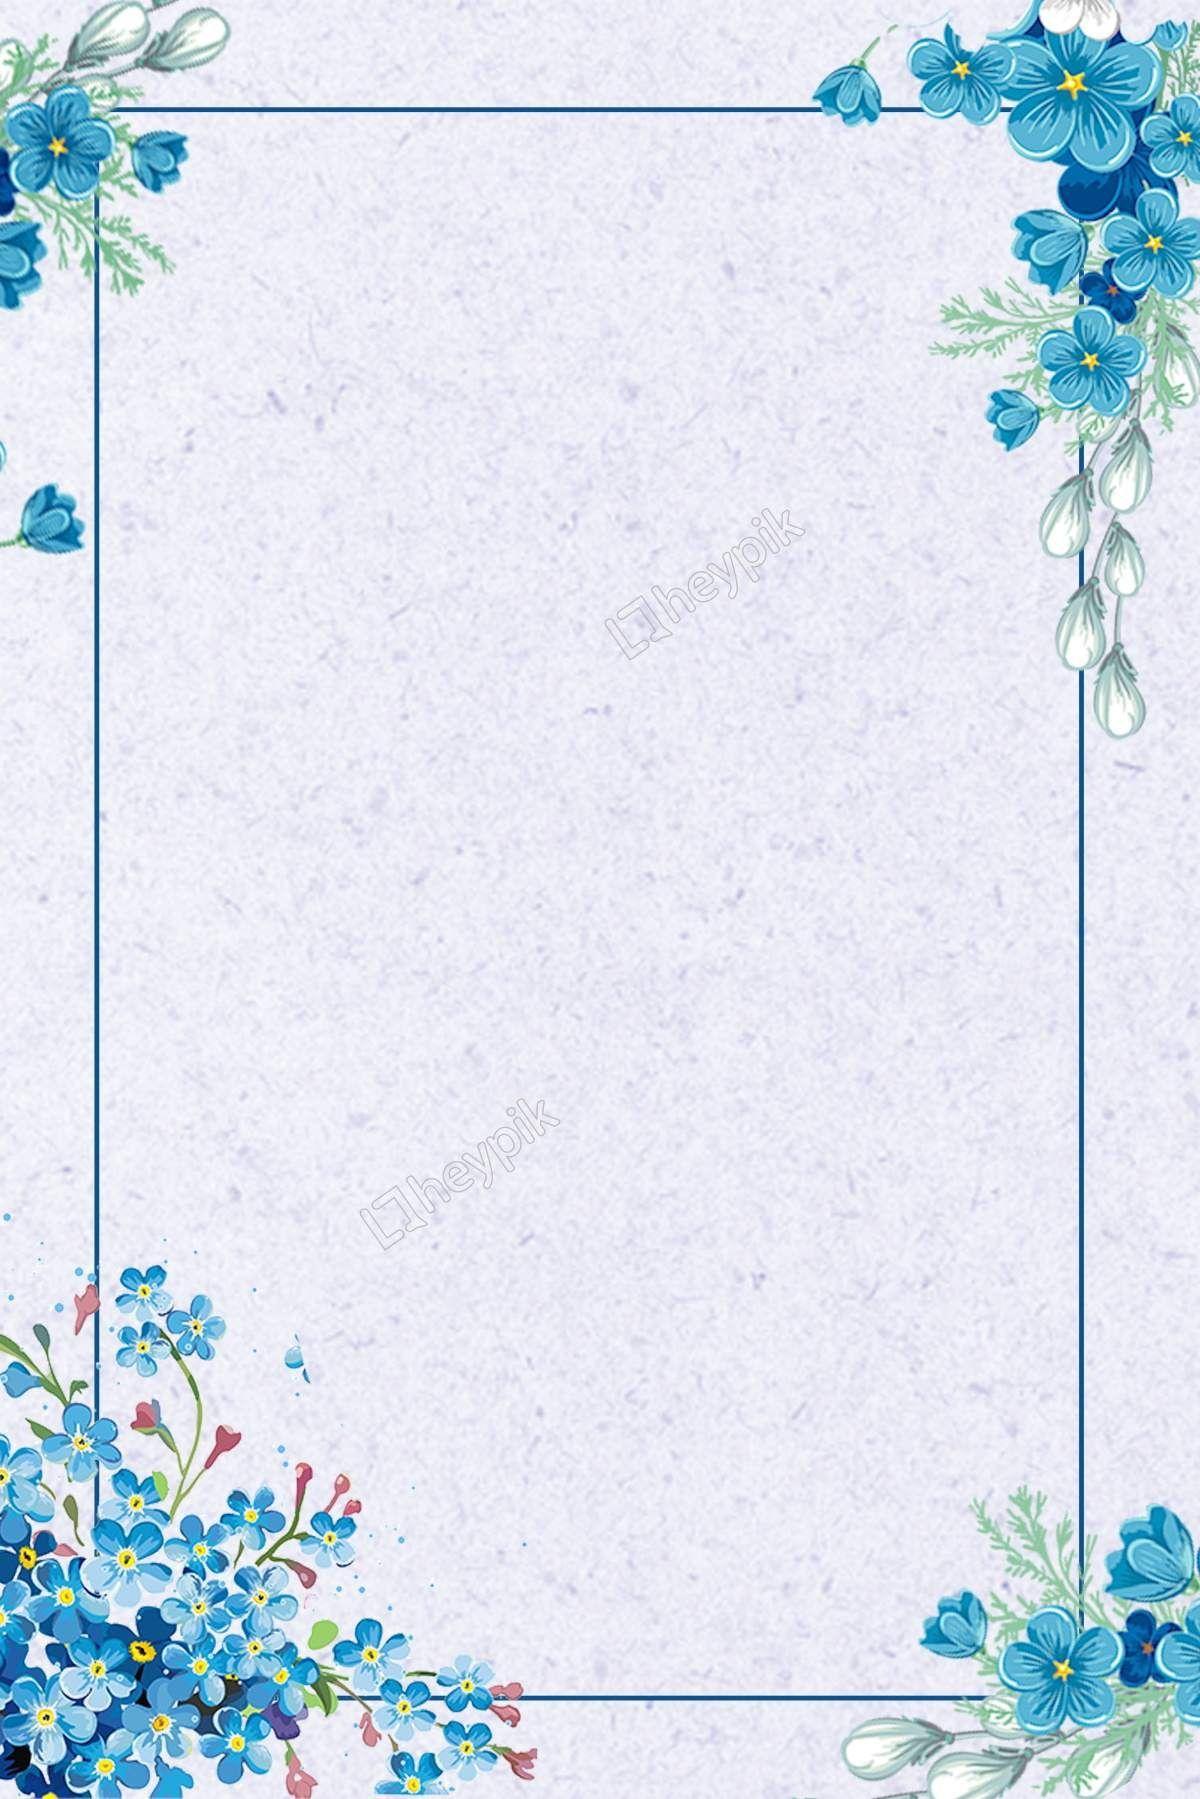 Blue Wallpaper iPhone Wallpaper in 2019 Watercolor